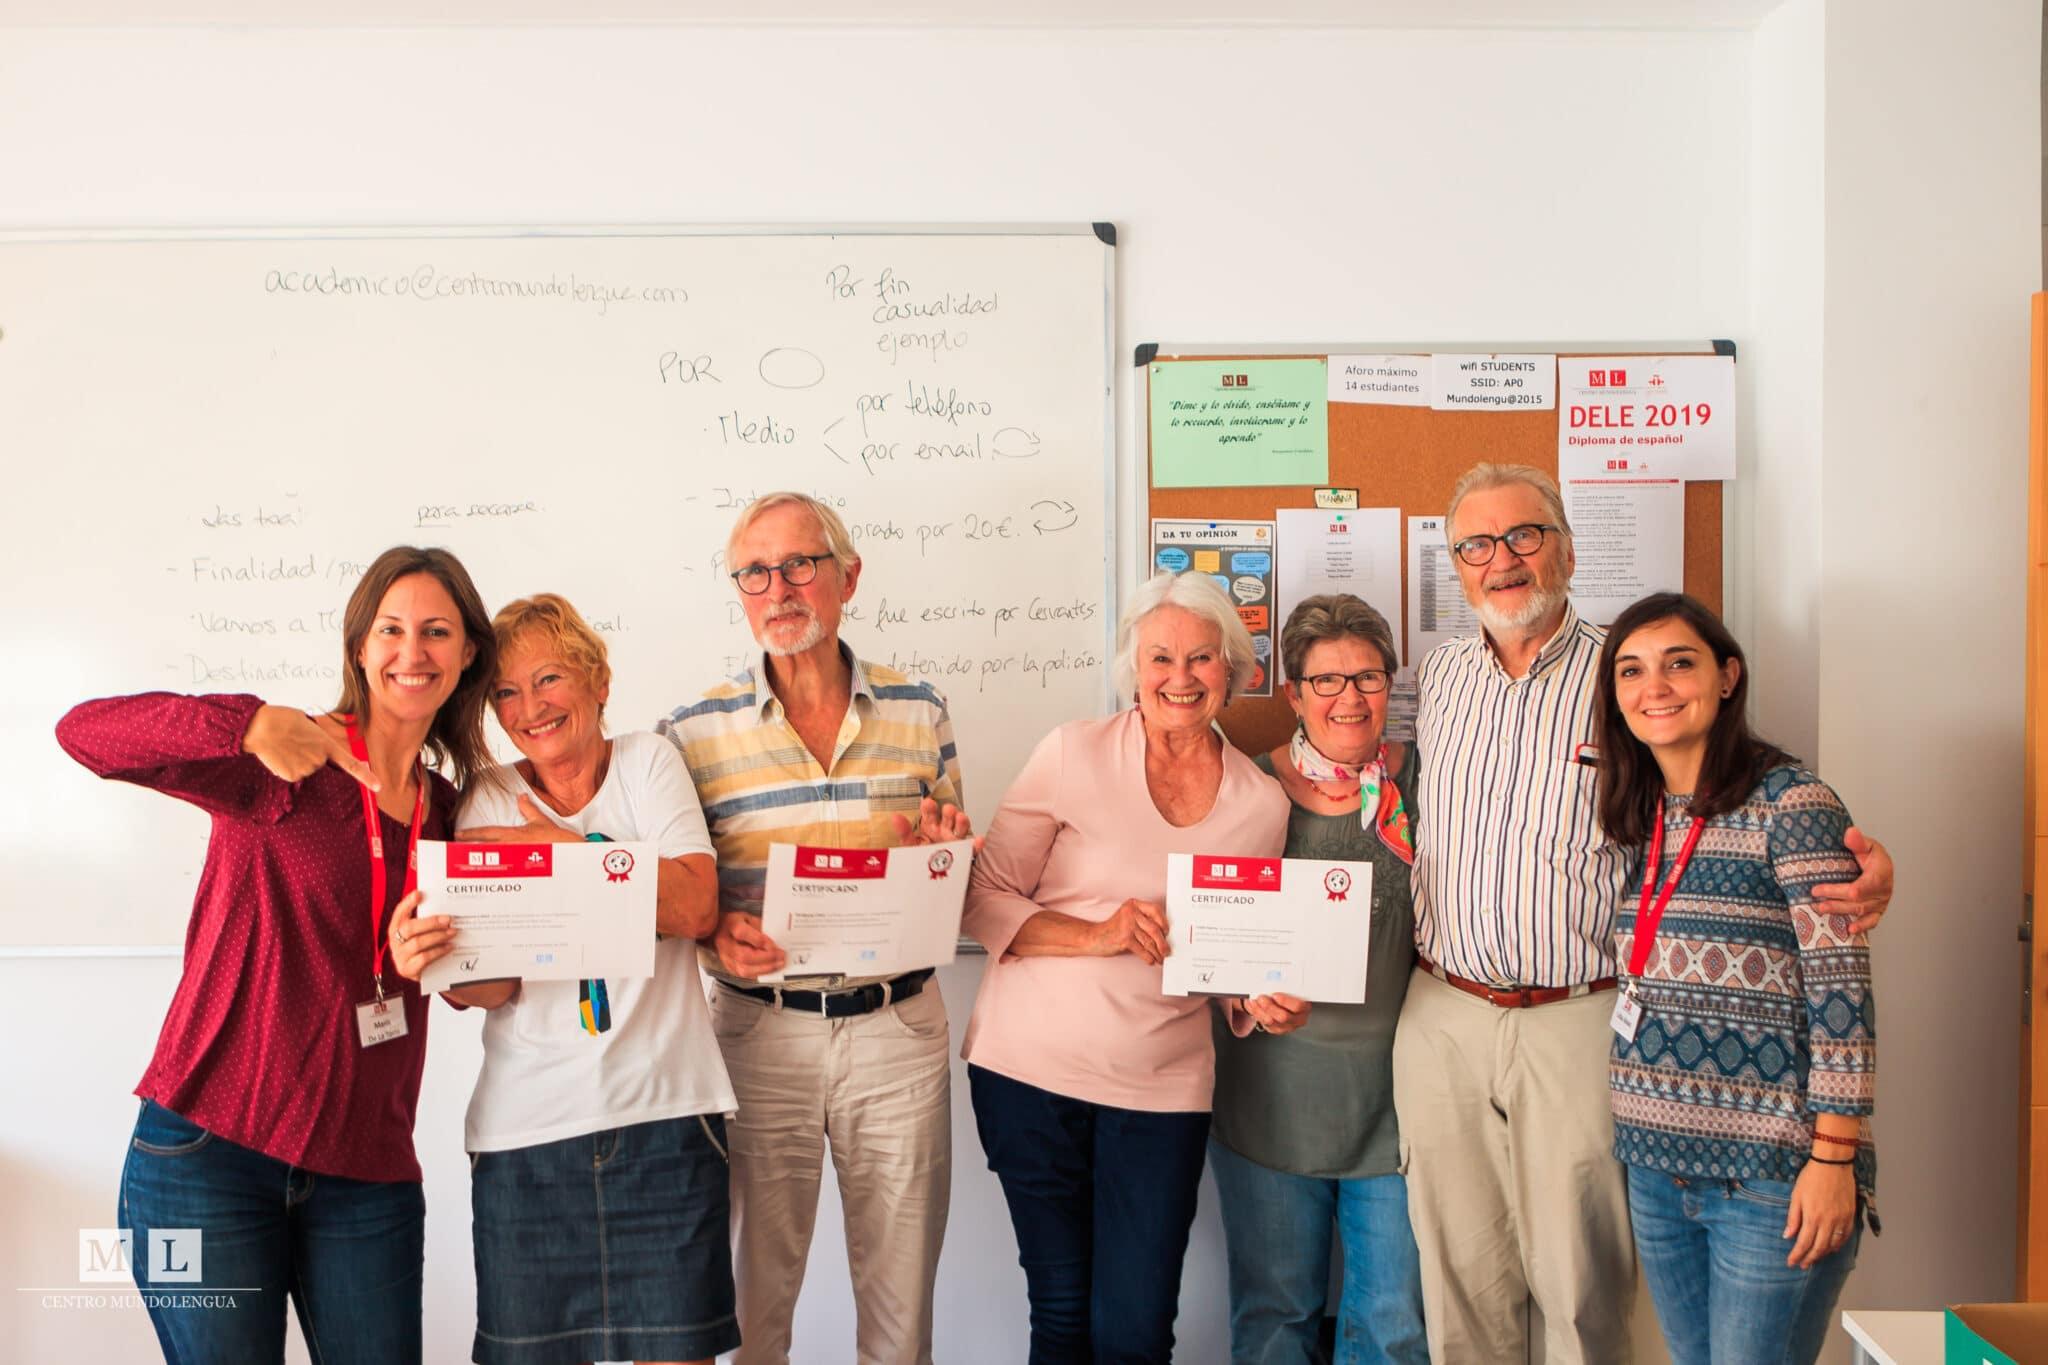 DELE exam preparation in Sevilla, Spain